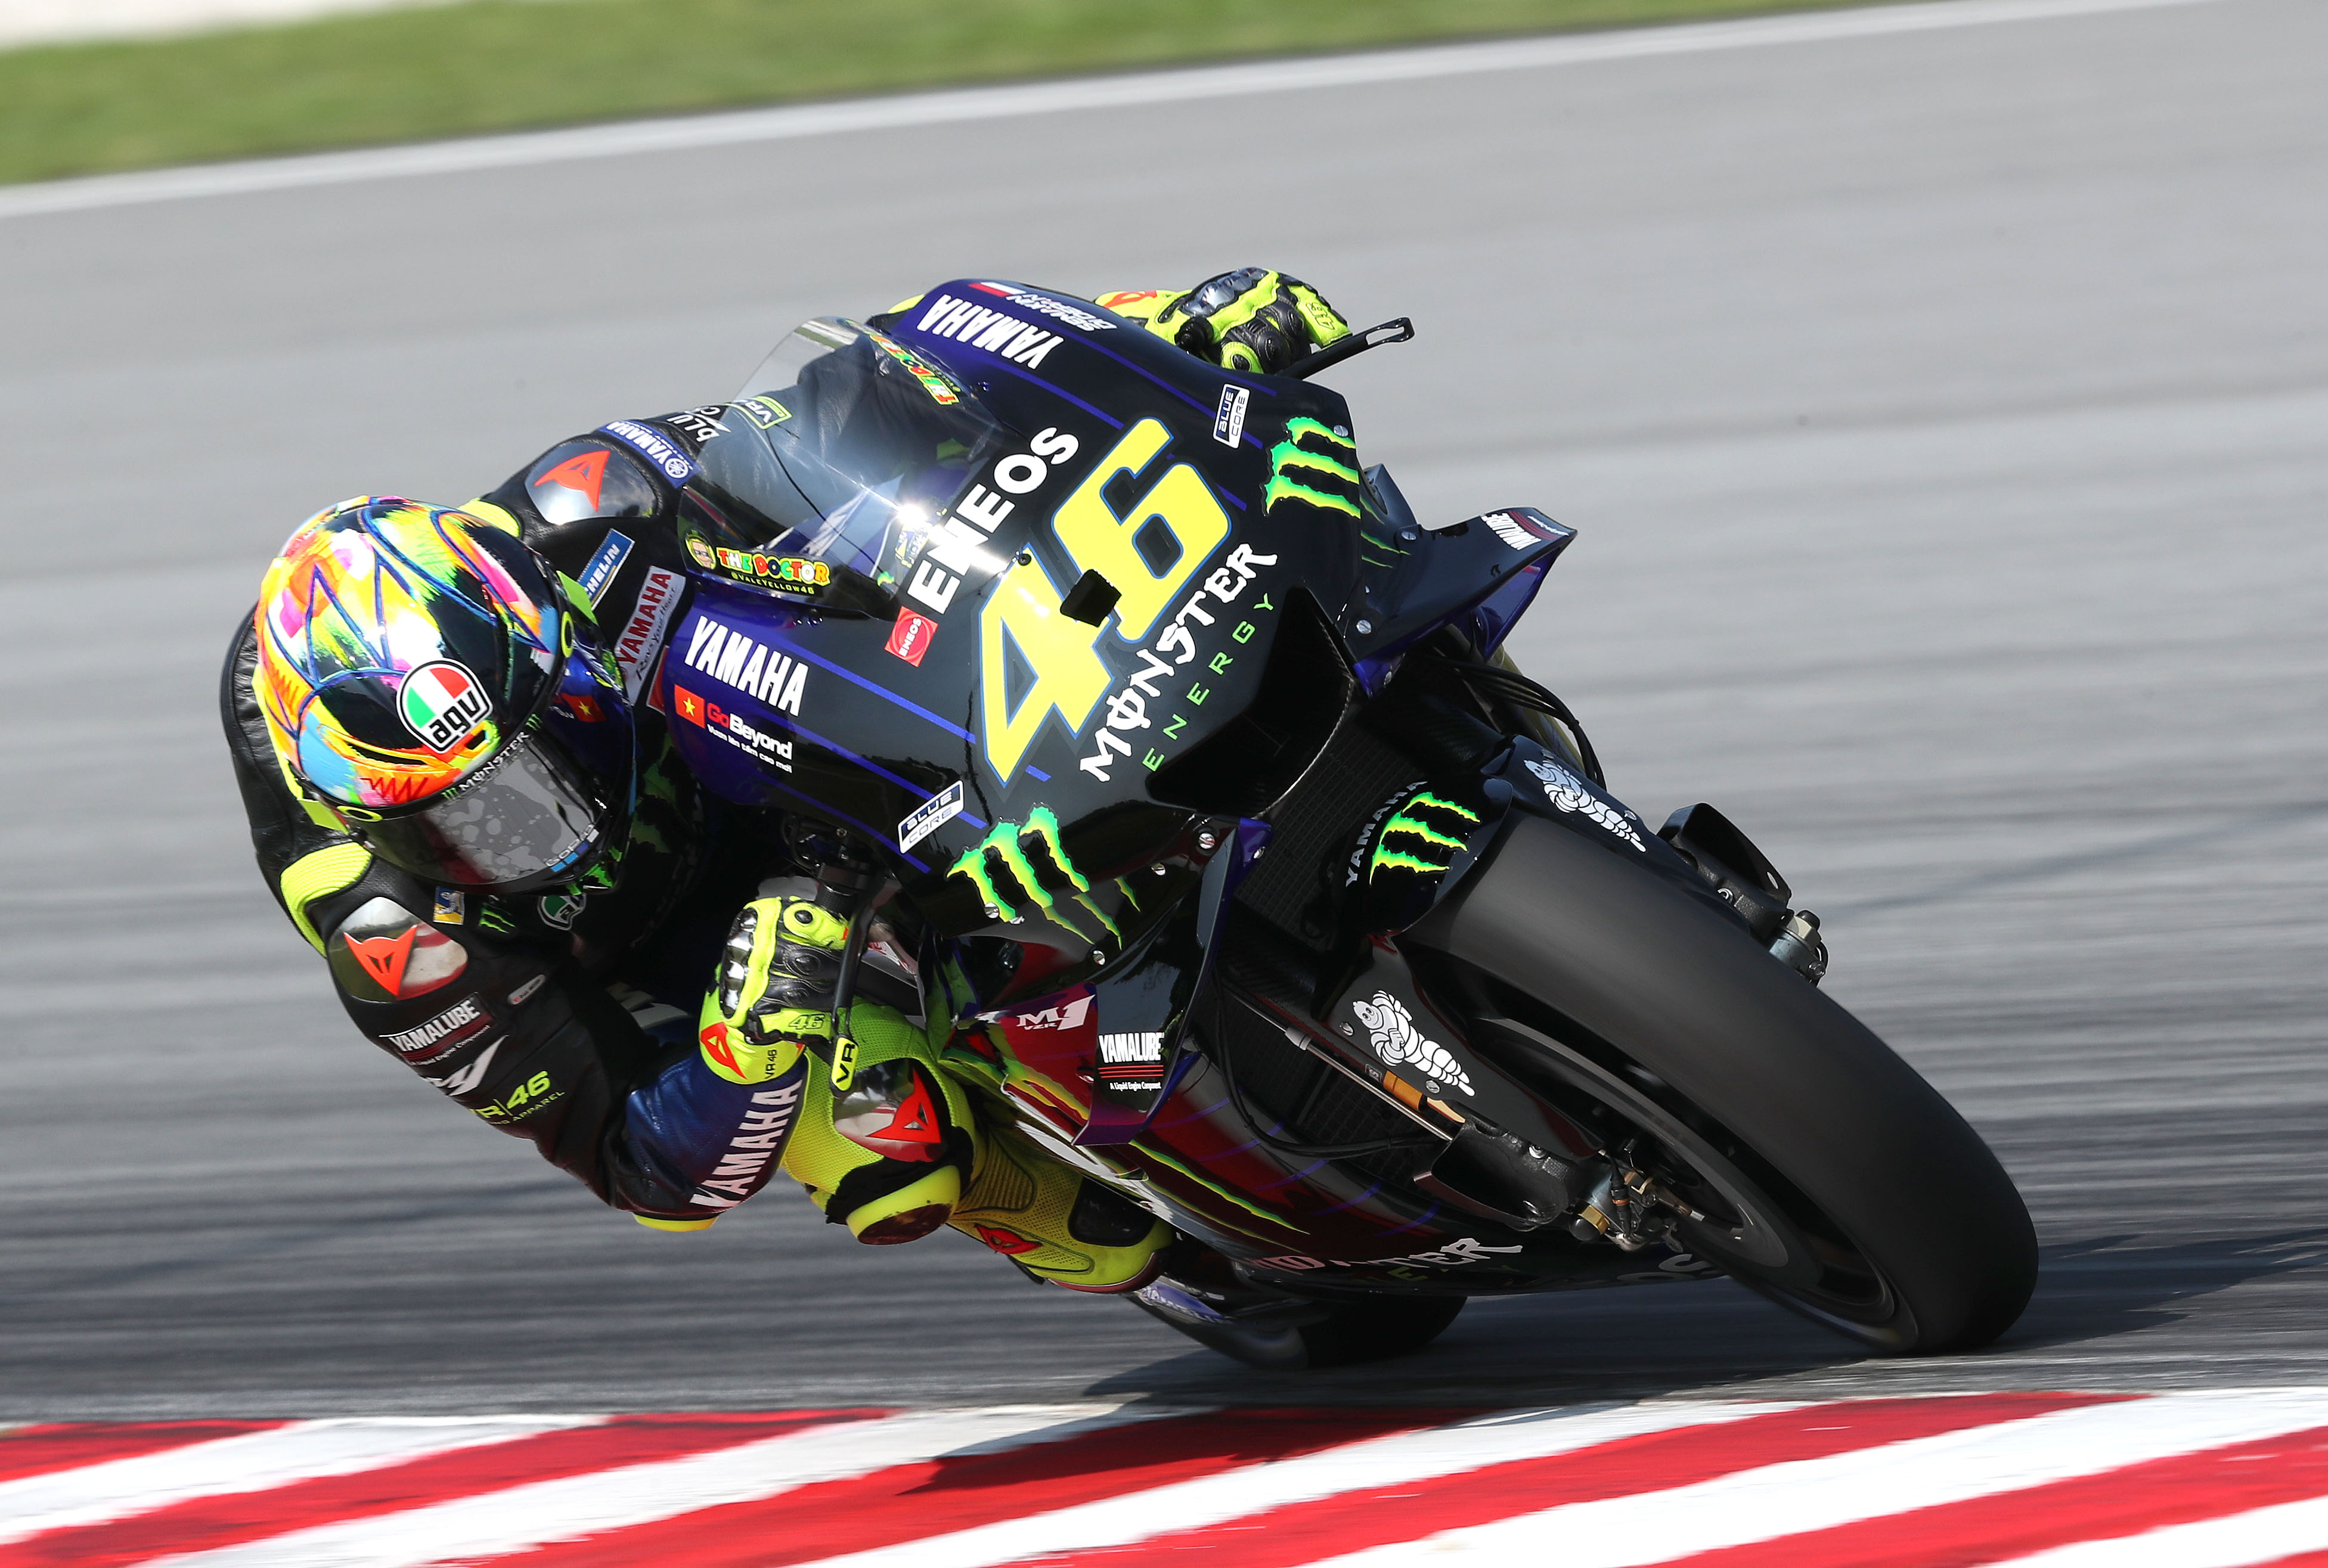 MotoGP: Marquez claims 7th Sachsenring success / News